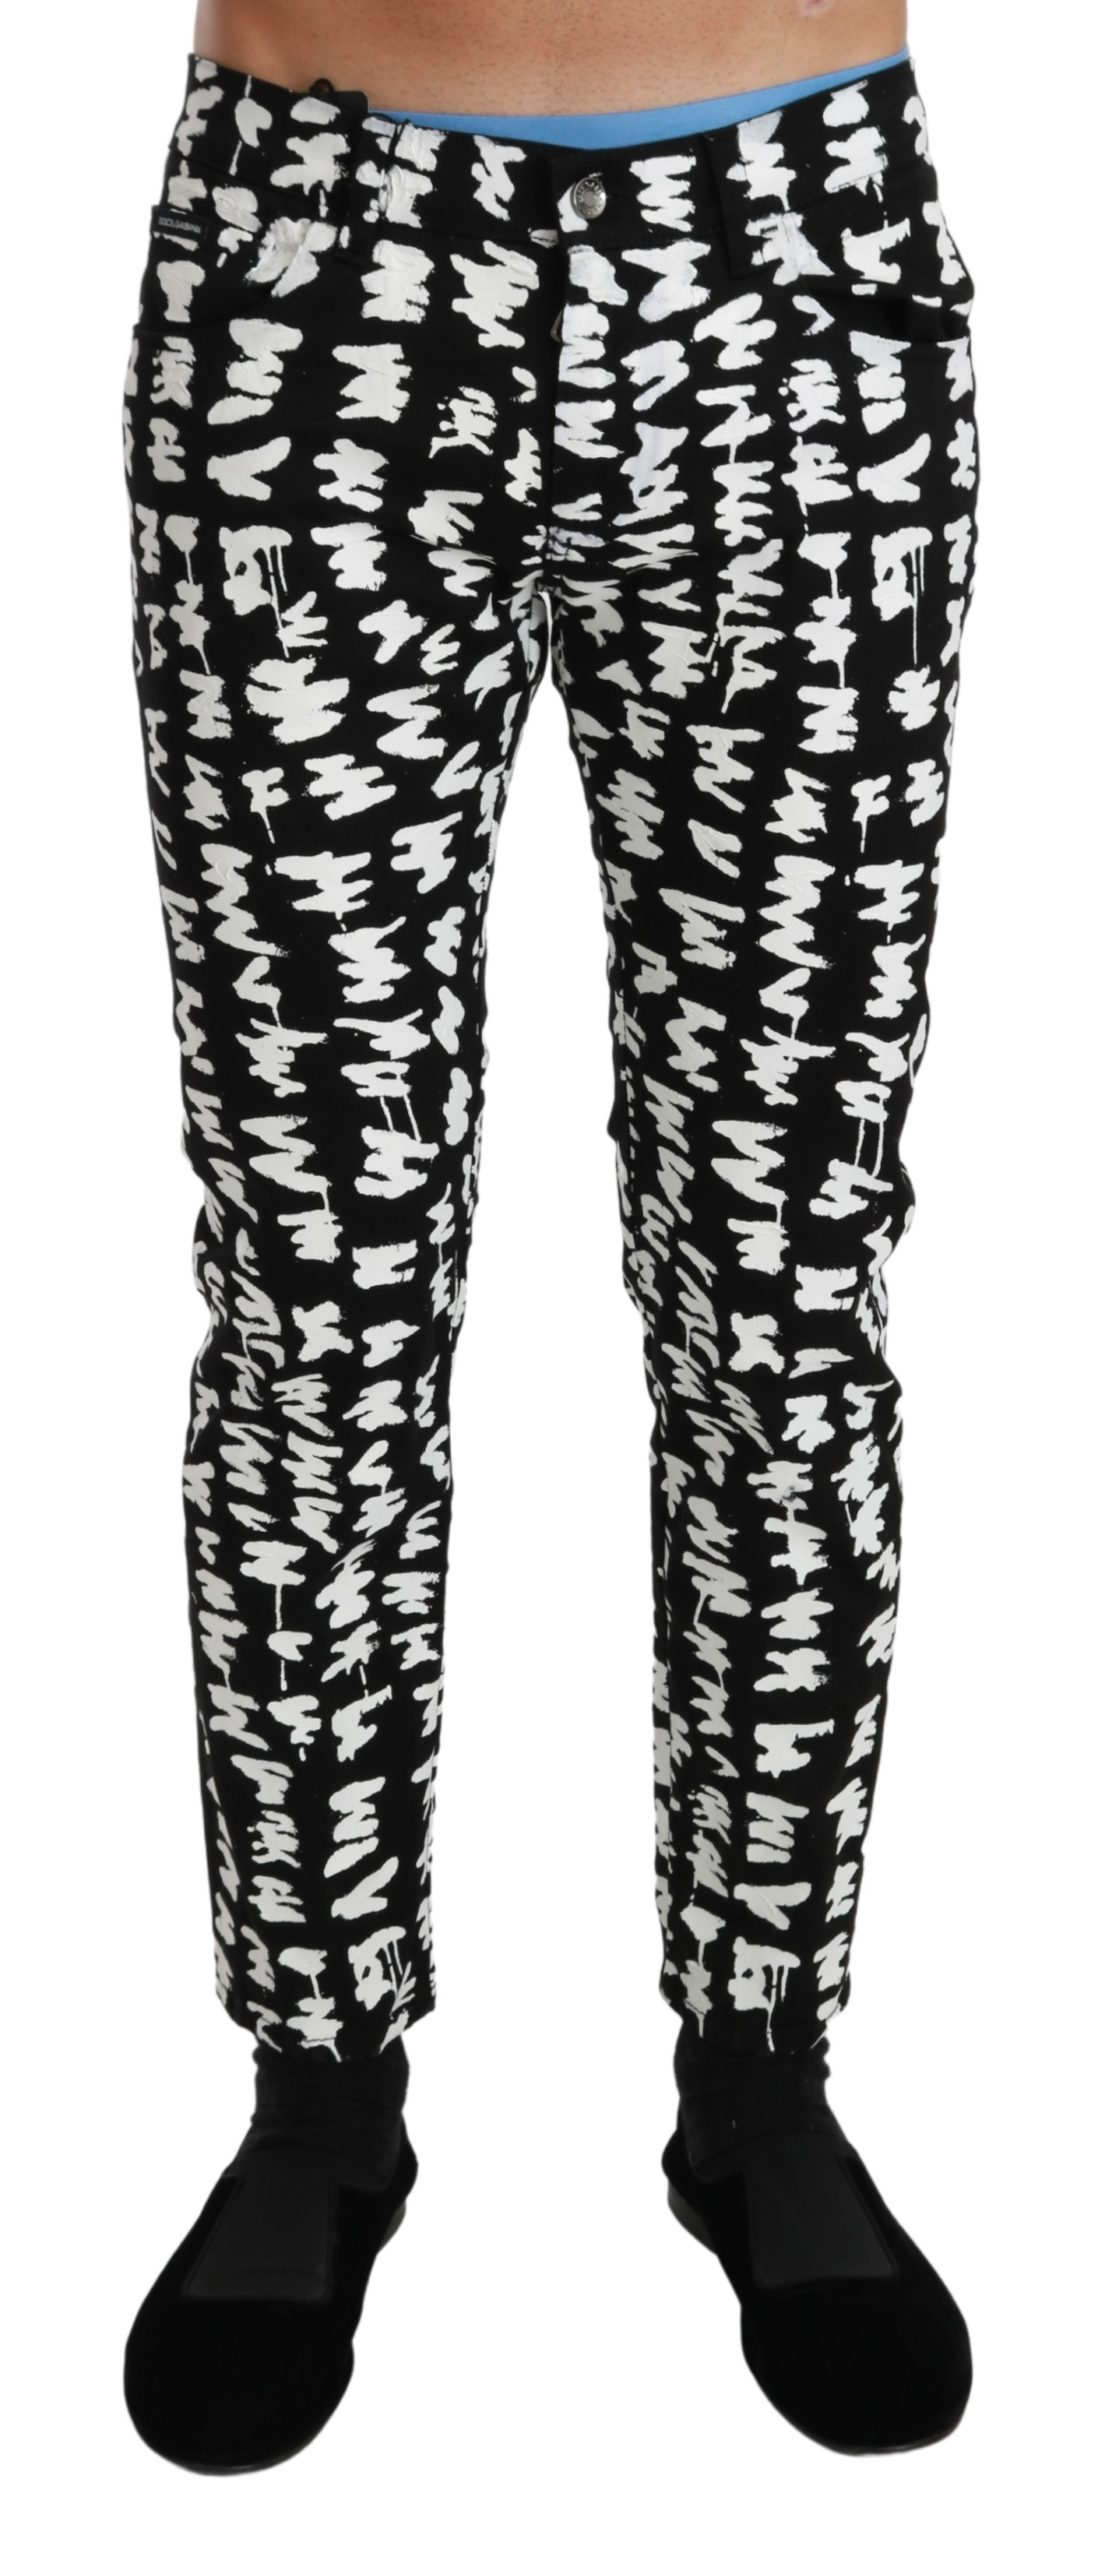 Dolce & Gabbana Men's Cotton Stretch CLASSIC Jeans Black PAN71037 - IT44 | XS